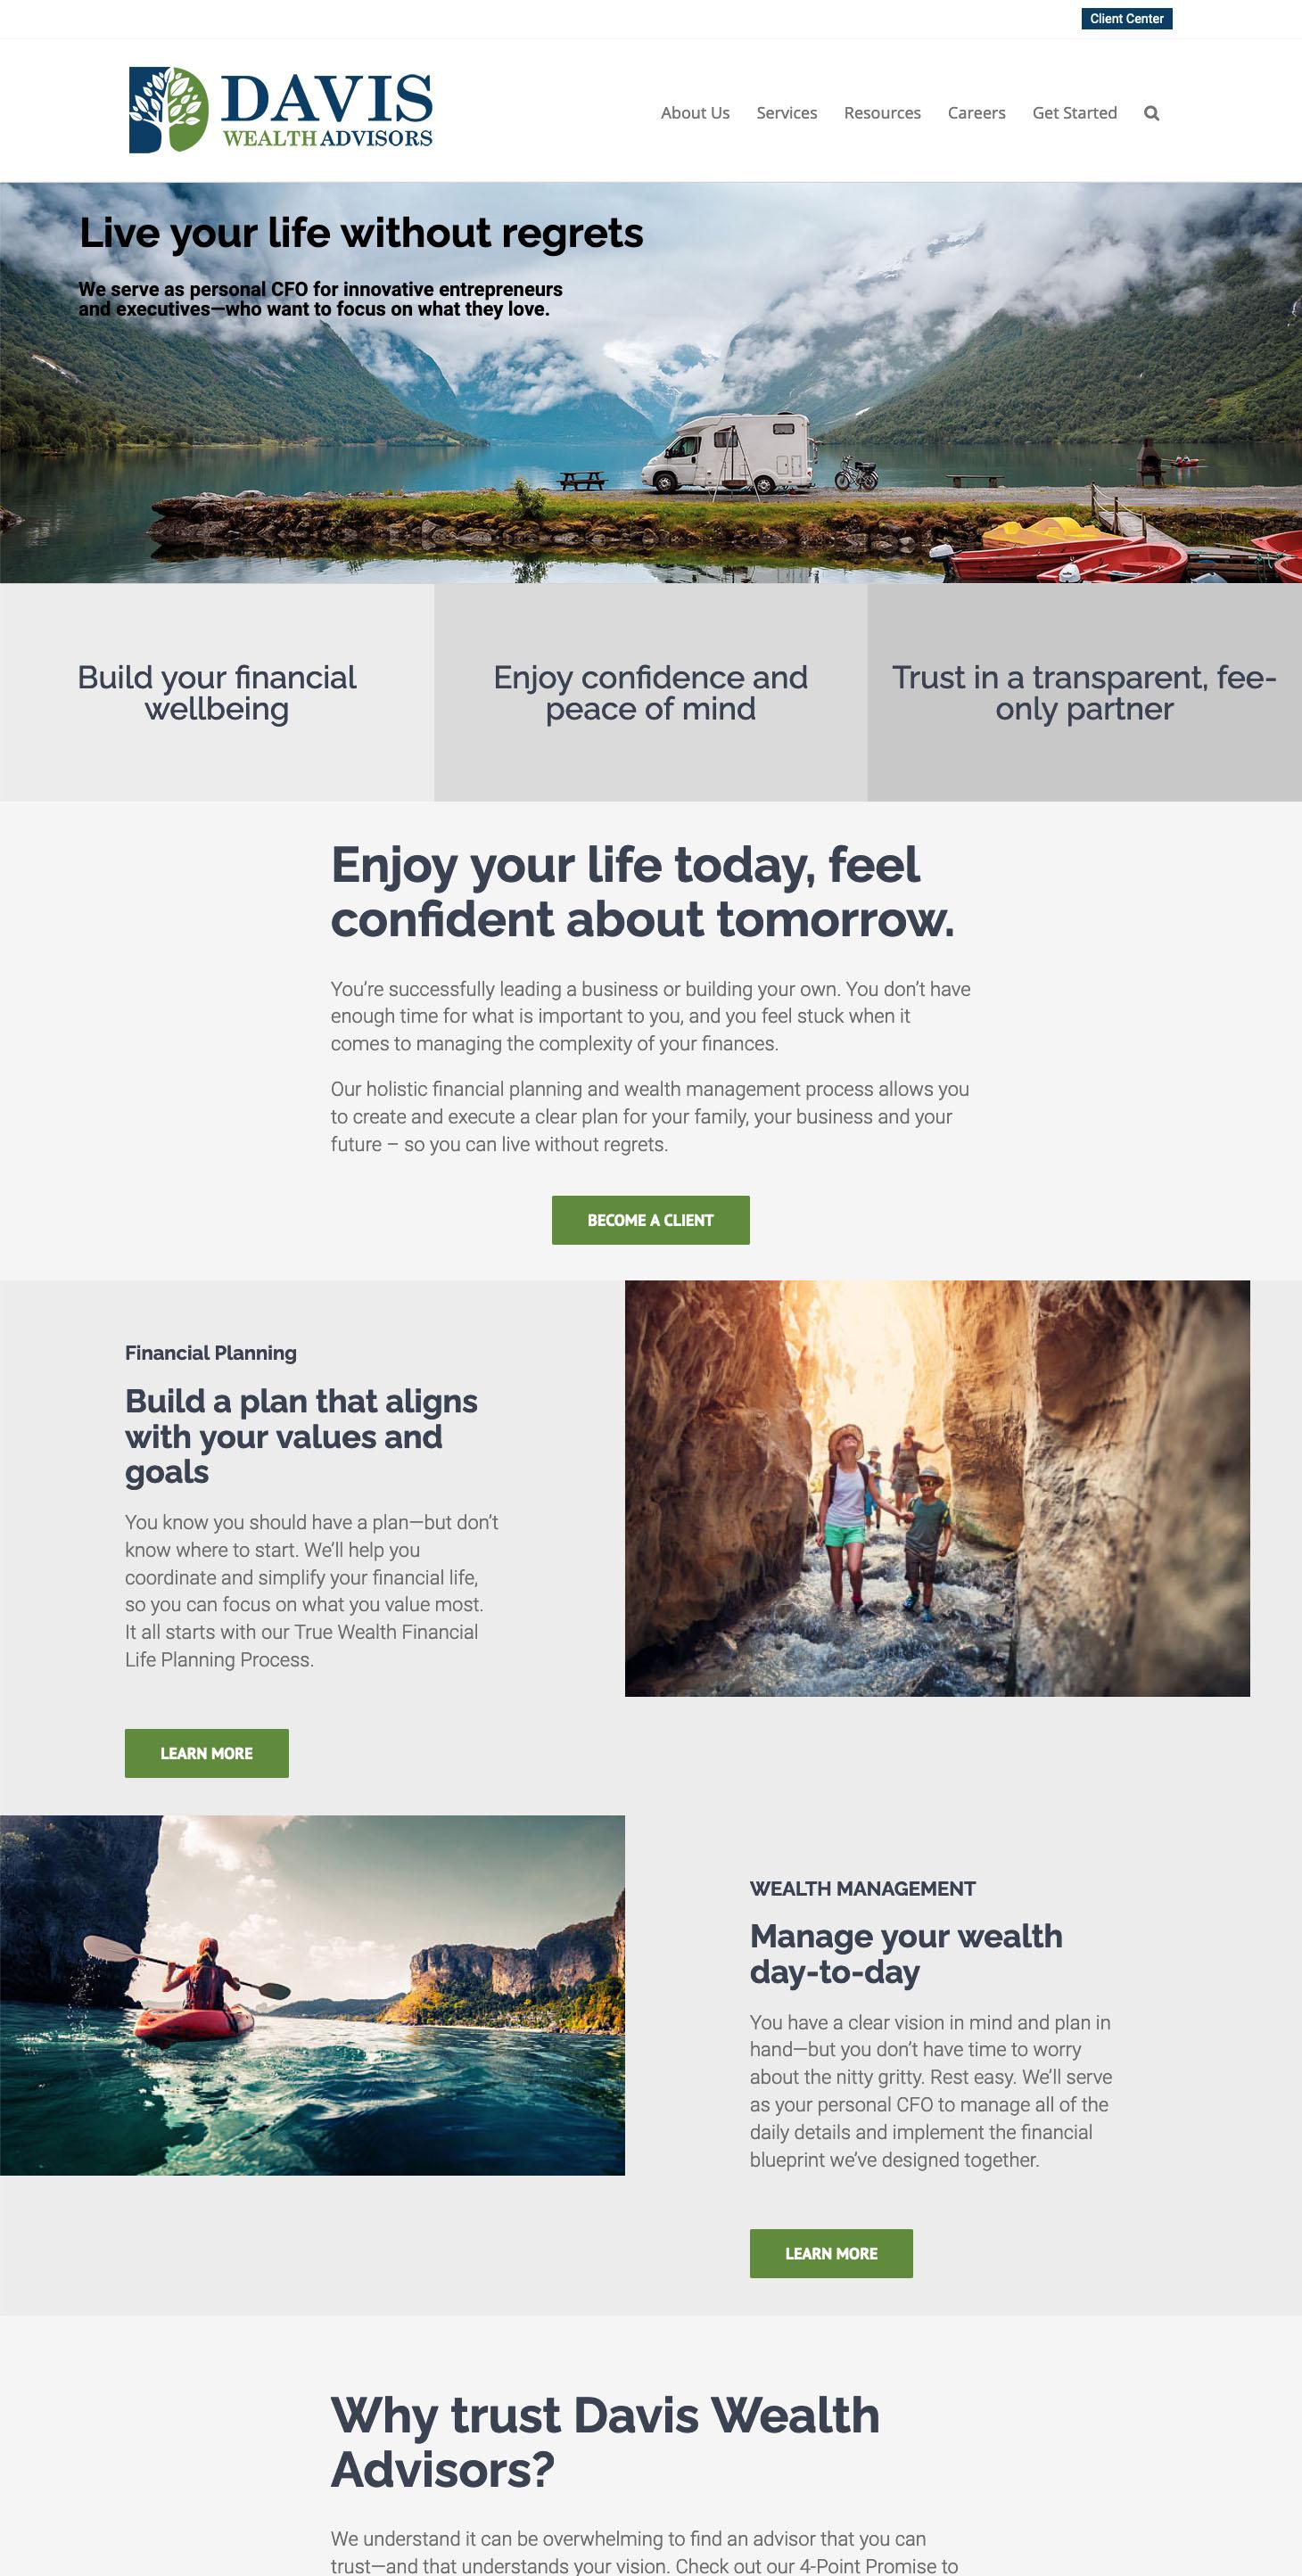 daviswealthadvisors-homepage